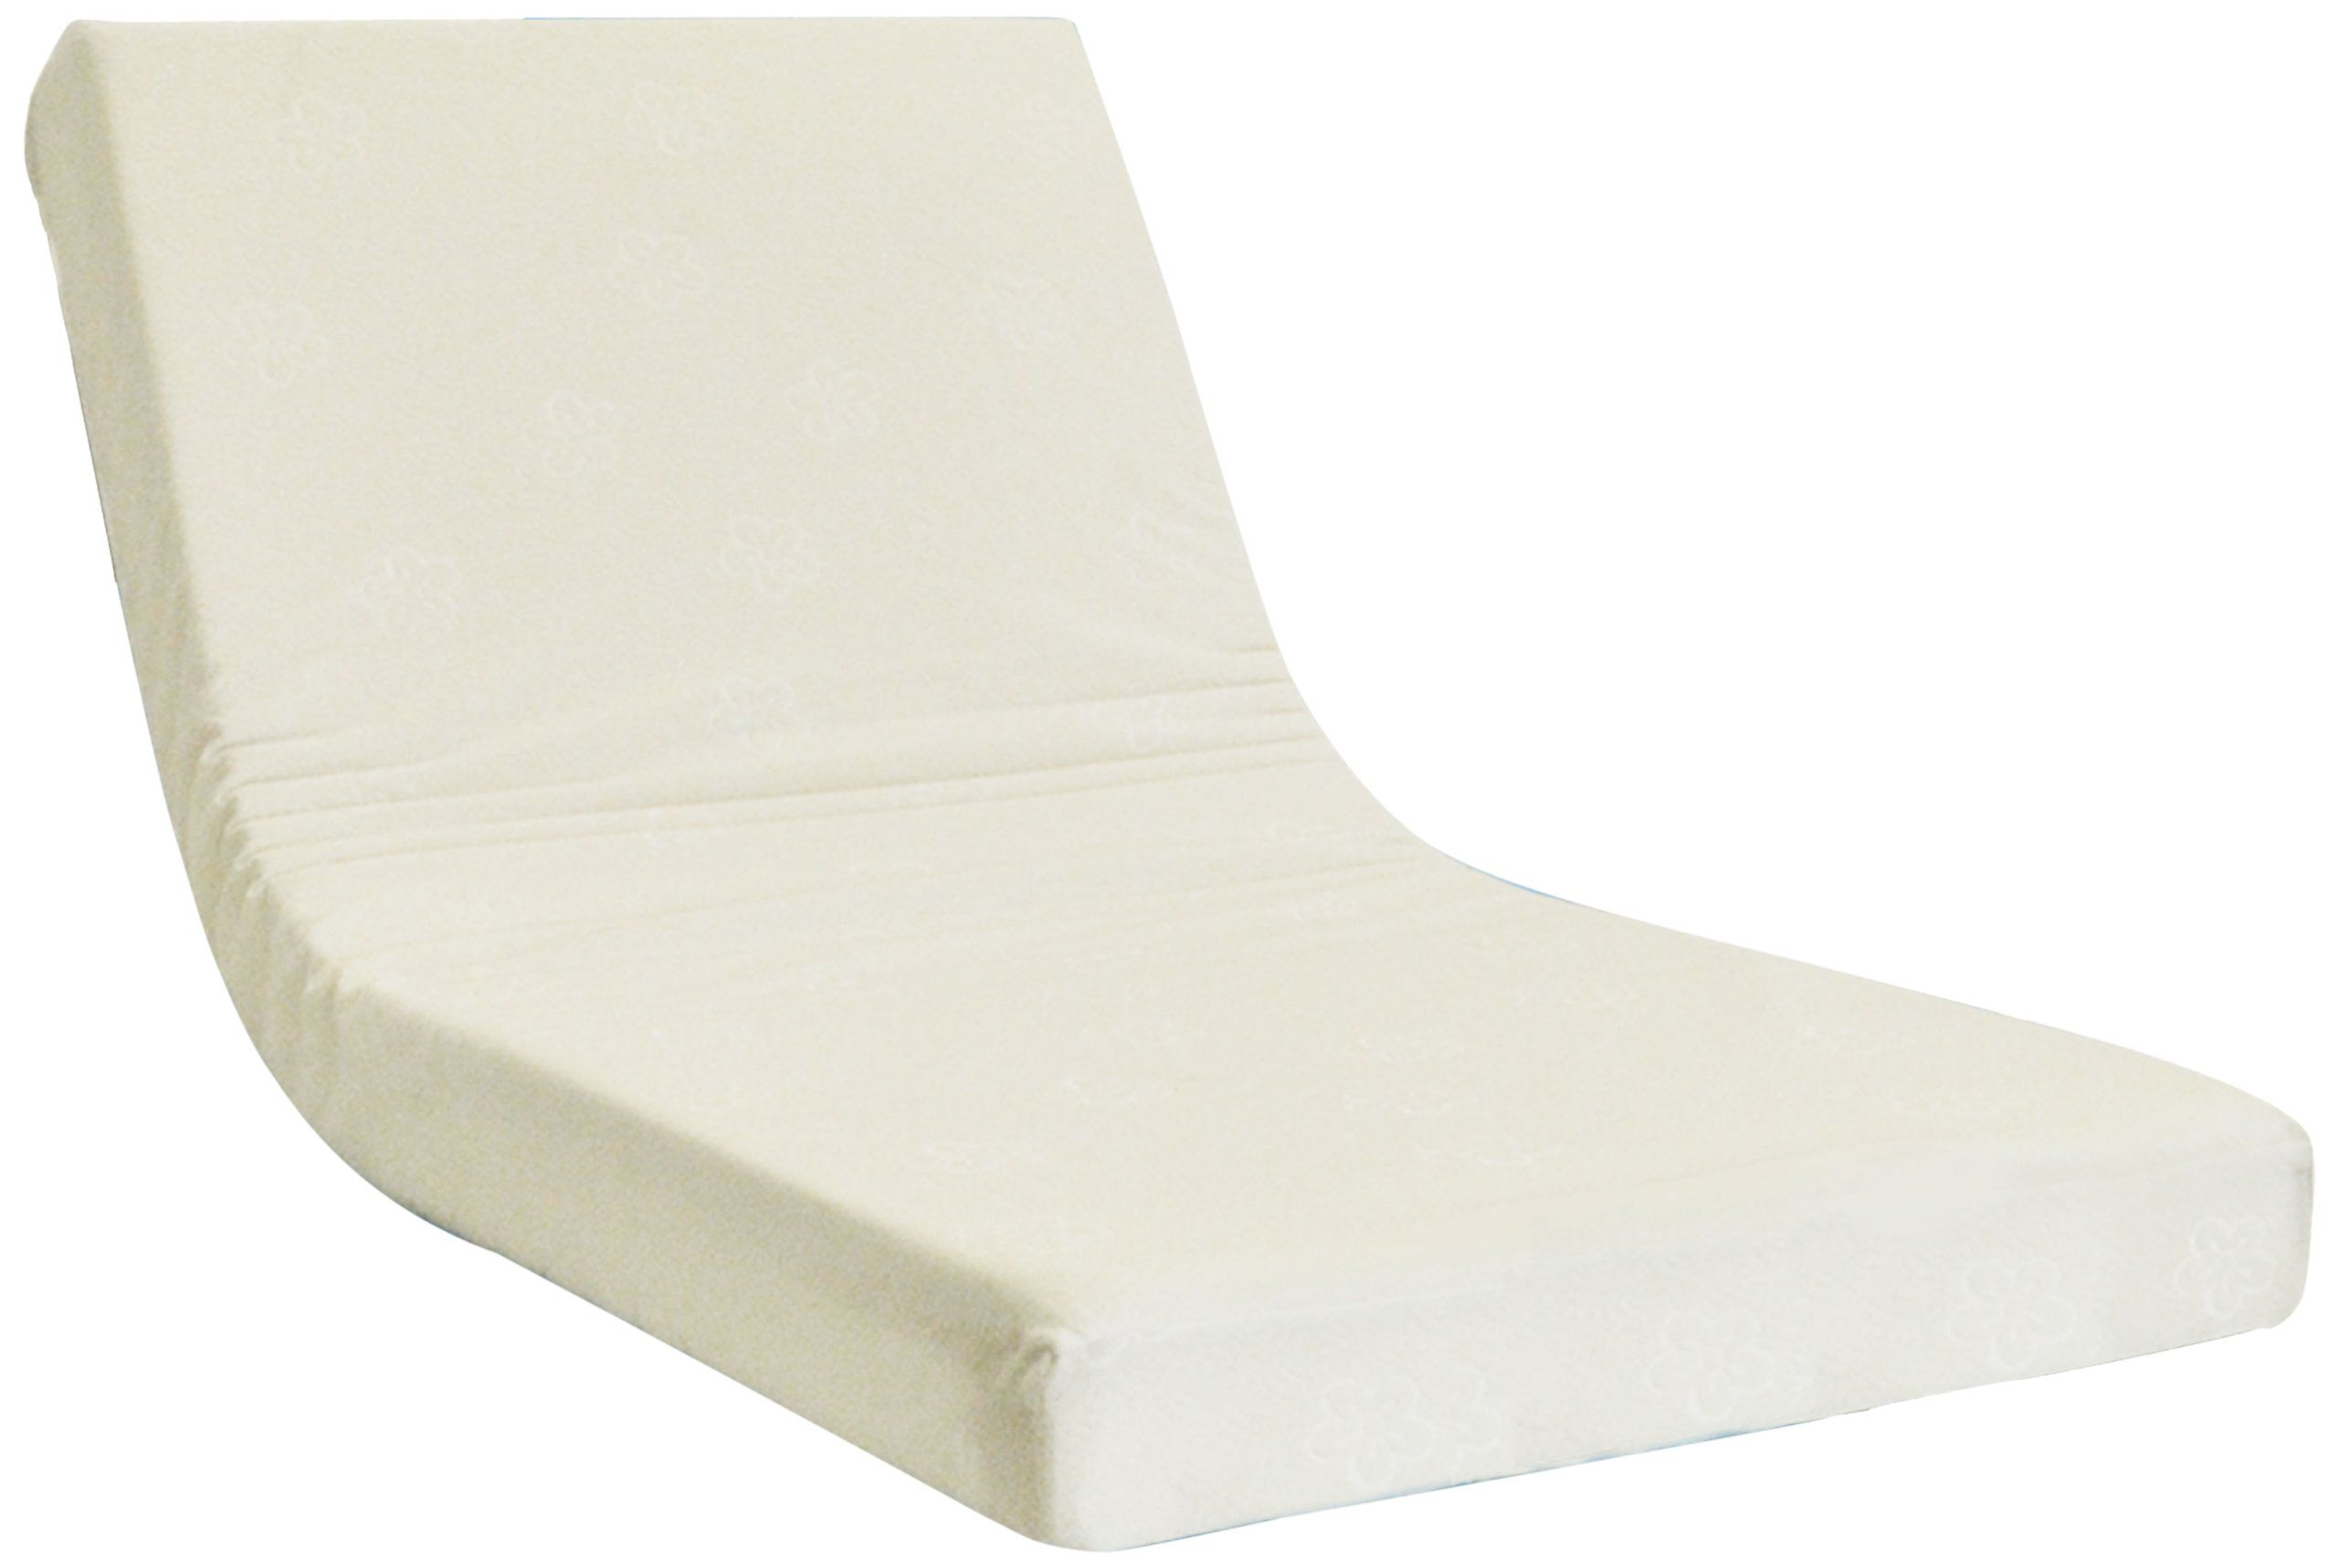 pragma bed cloud rest 6 inch memory foam mattress twin x large